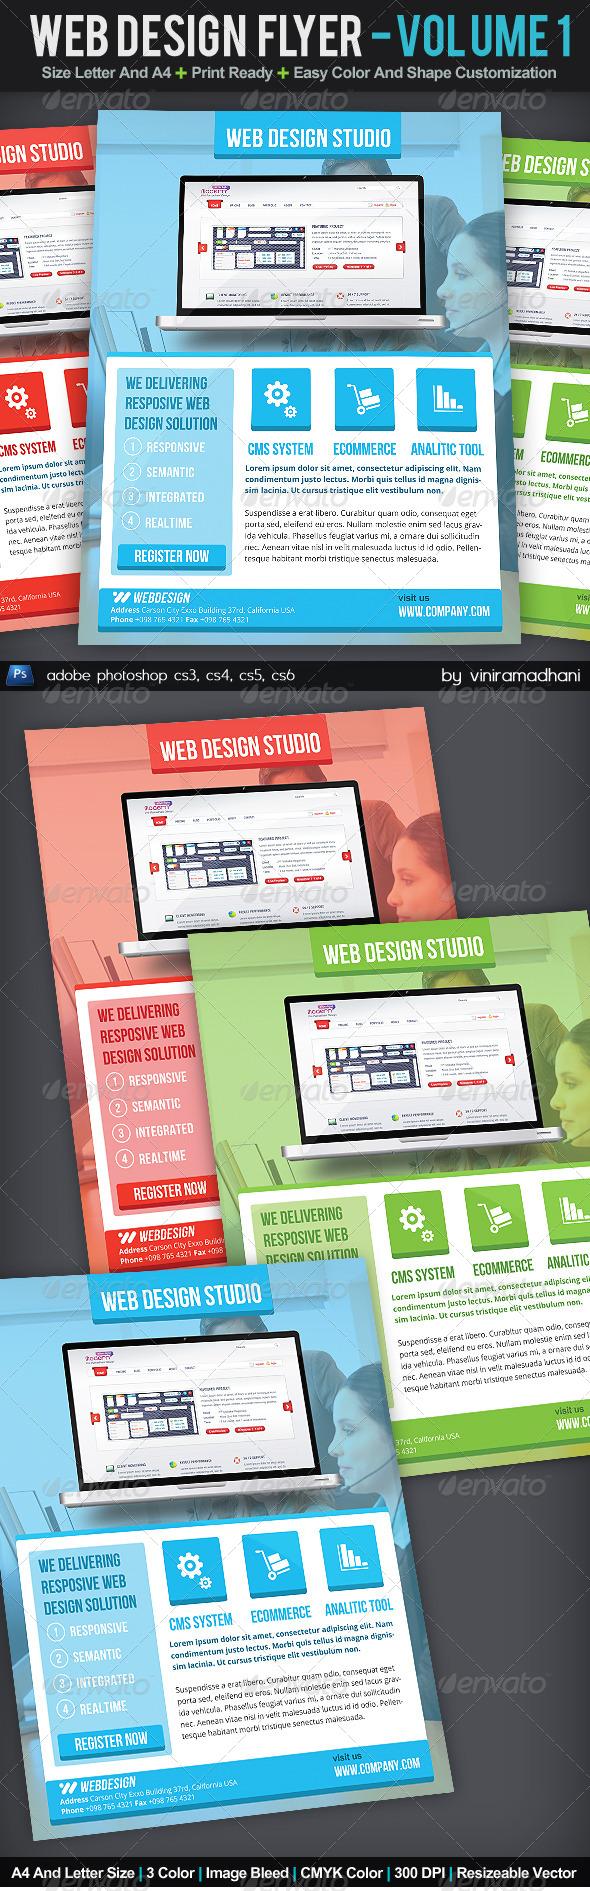 GraphicRiver Web Design Flyer Volume 1 5986607